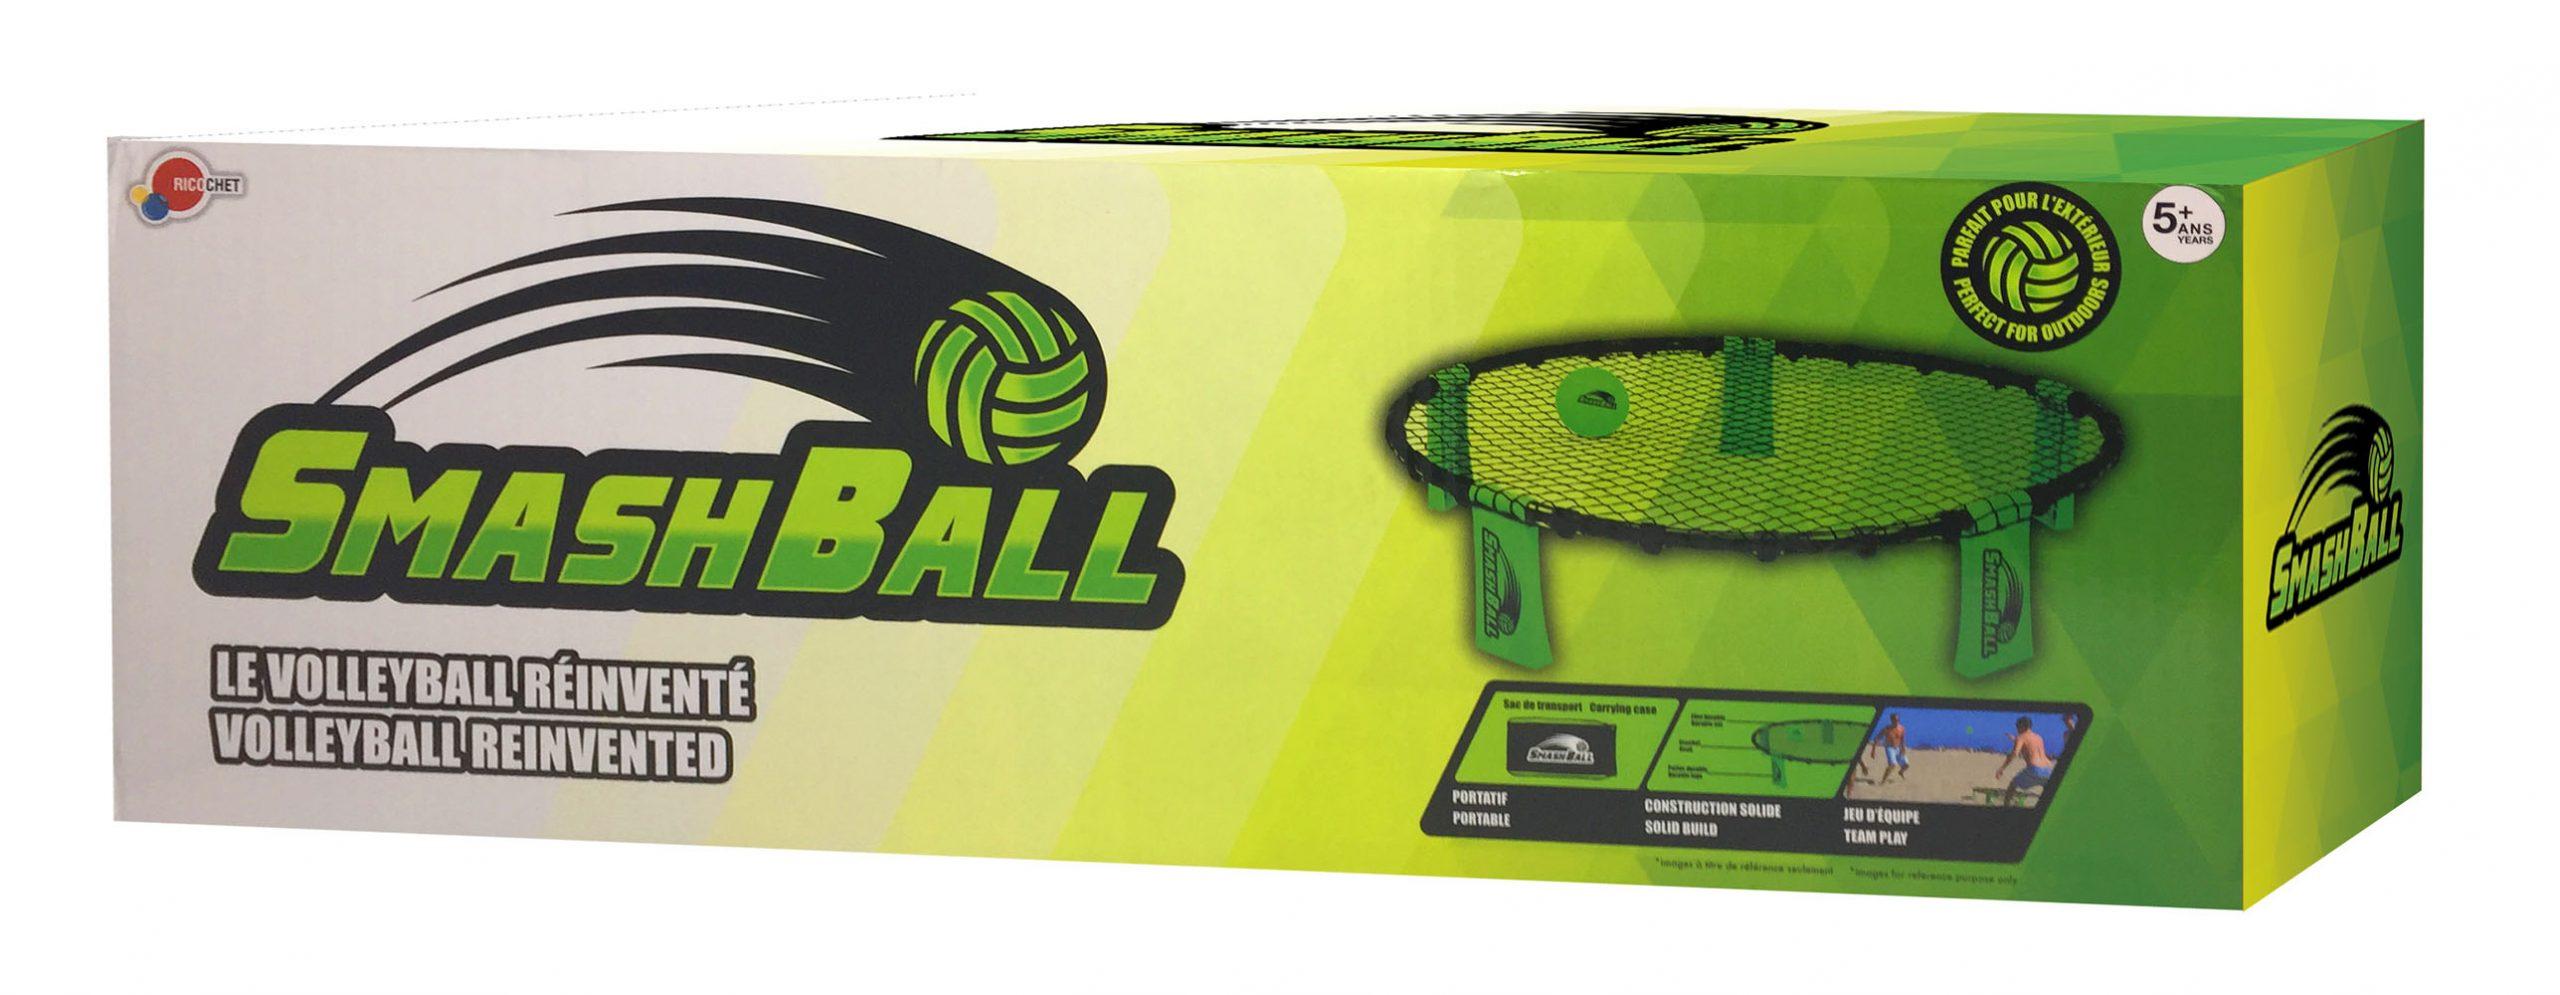 Smashball - Volleyball Réinventé à Ricochet Jeu